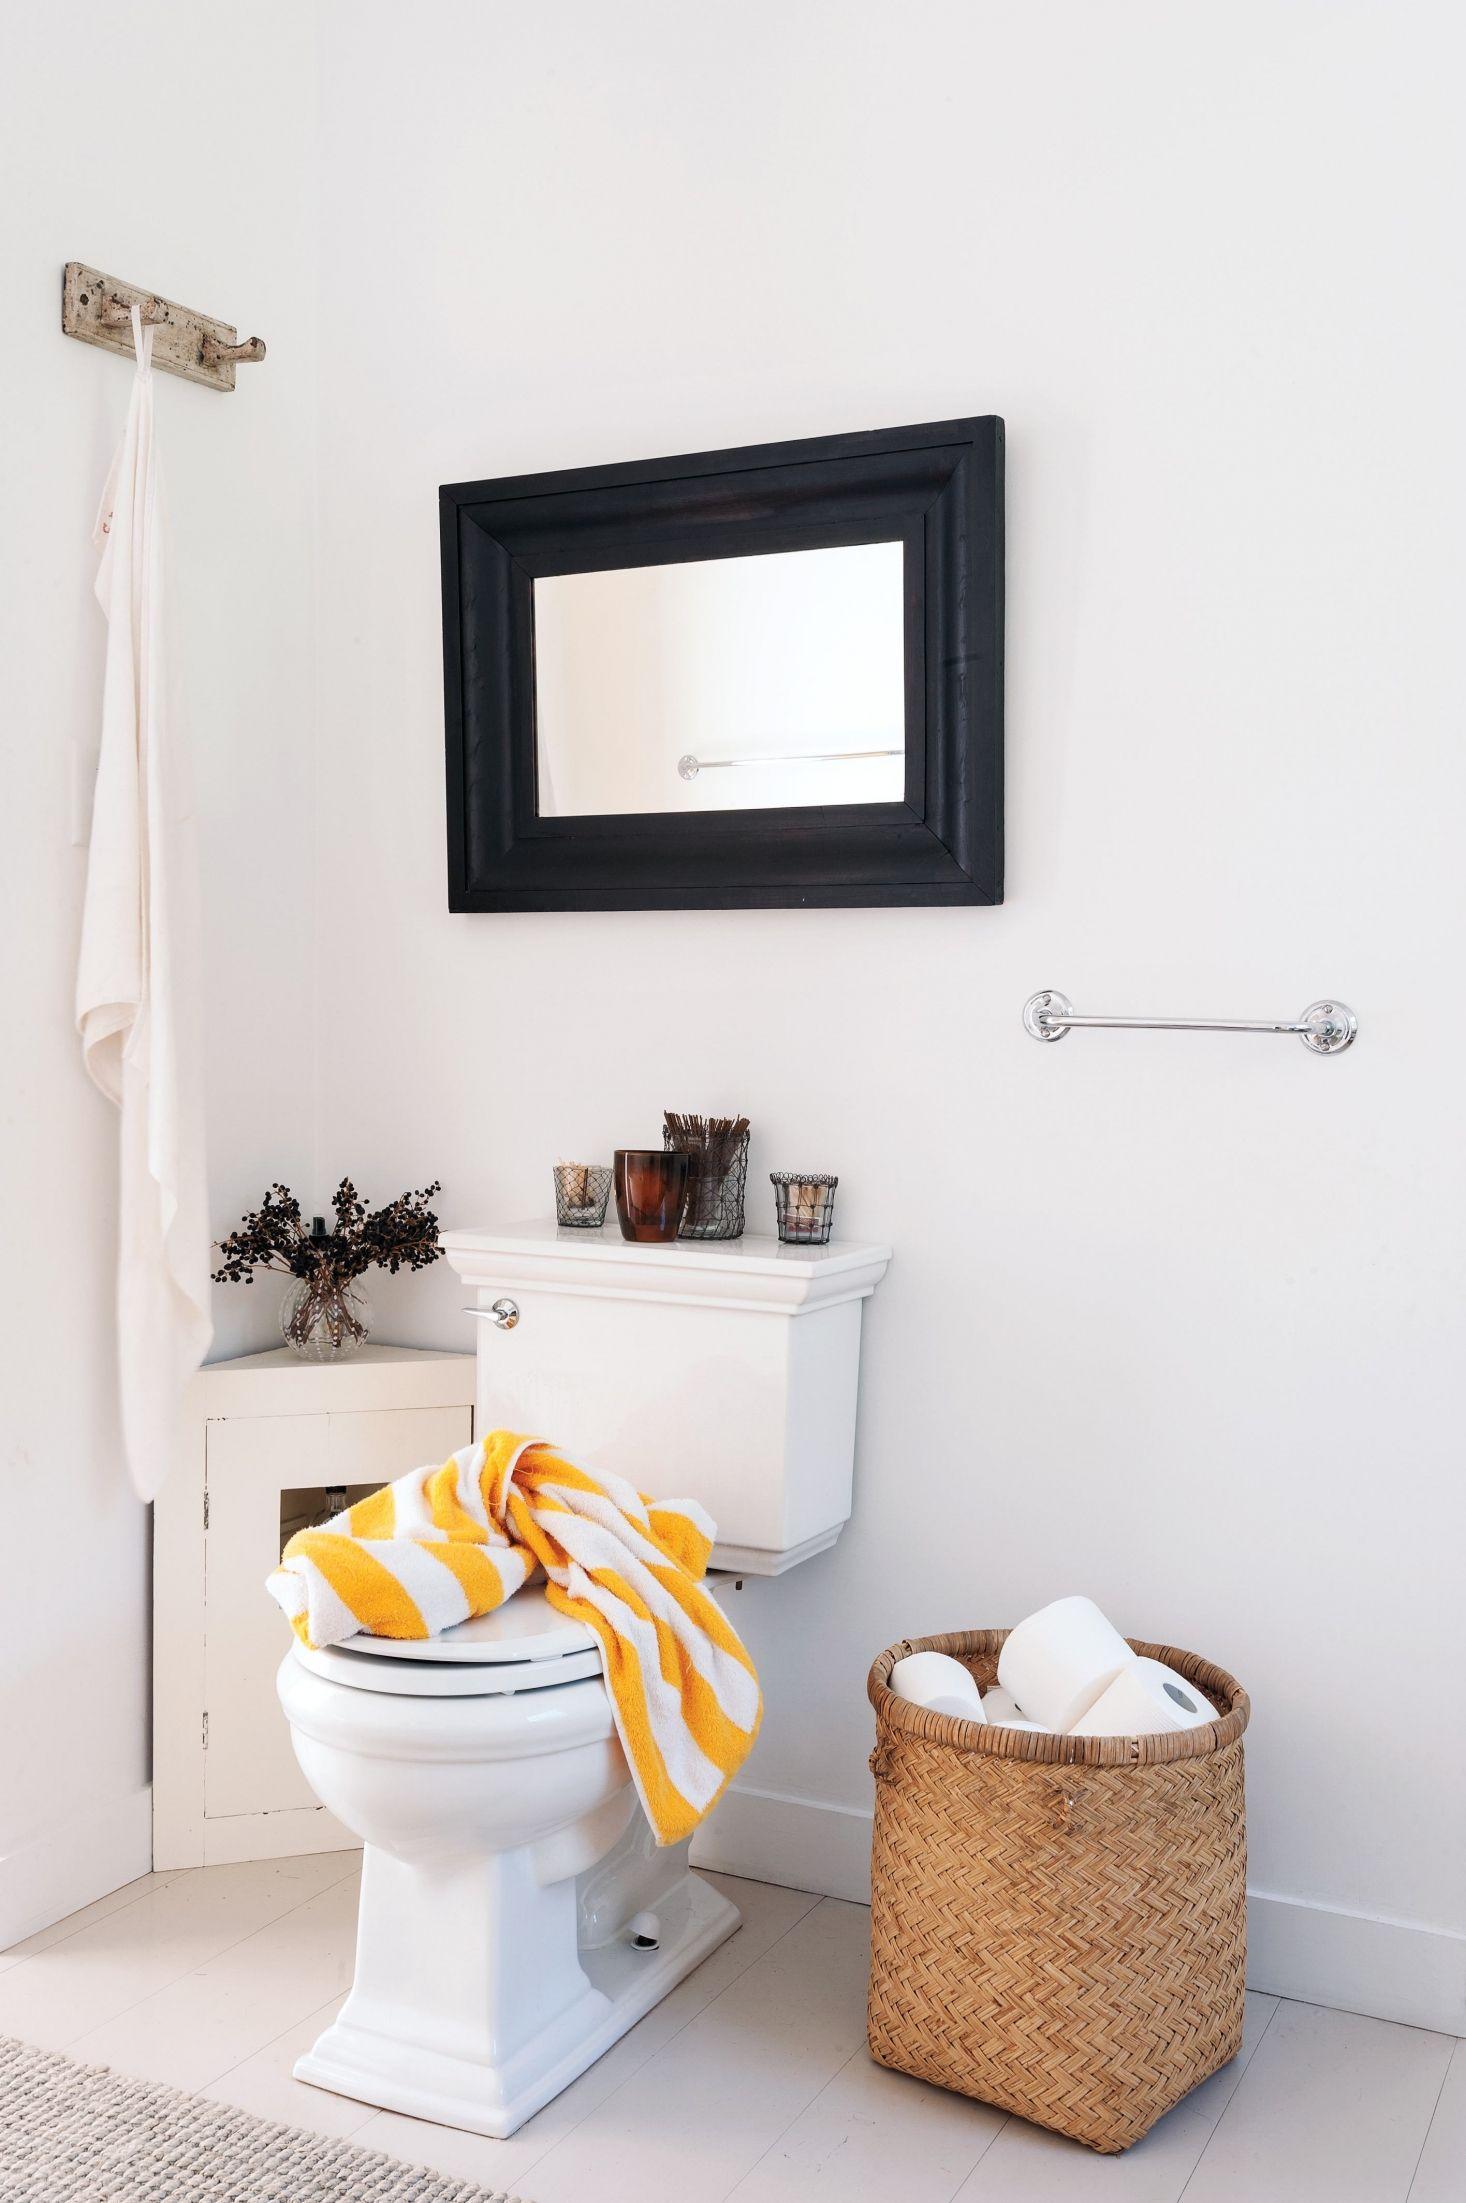 5 Quick Fixes Inventive Toilet Paper Storage Diy Toilet Paper